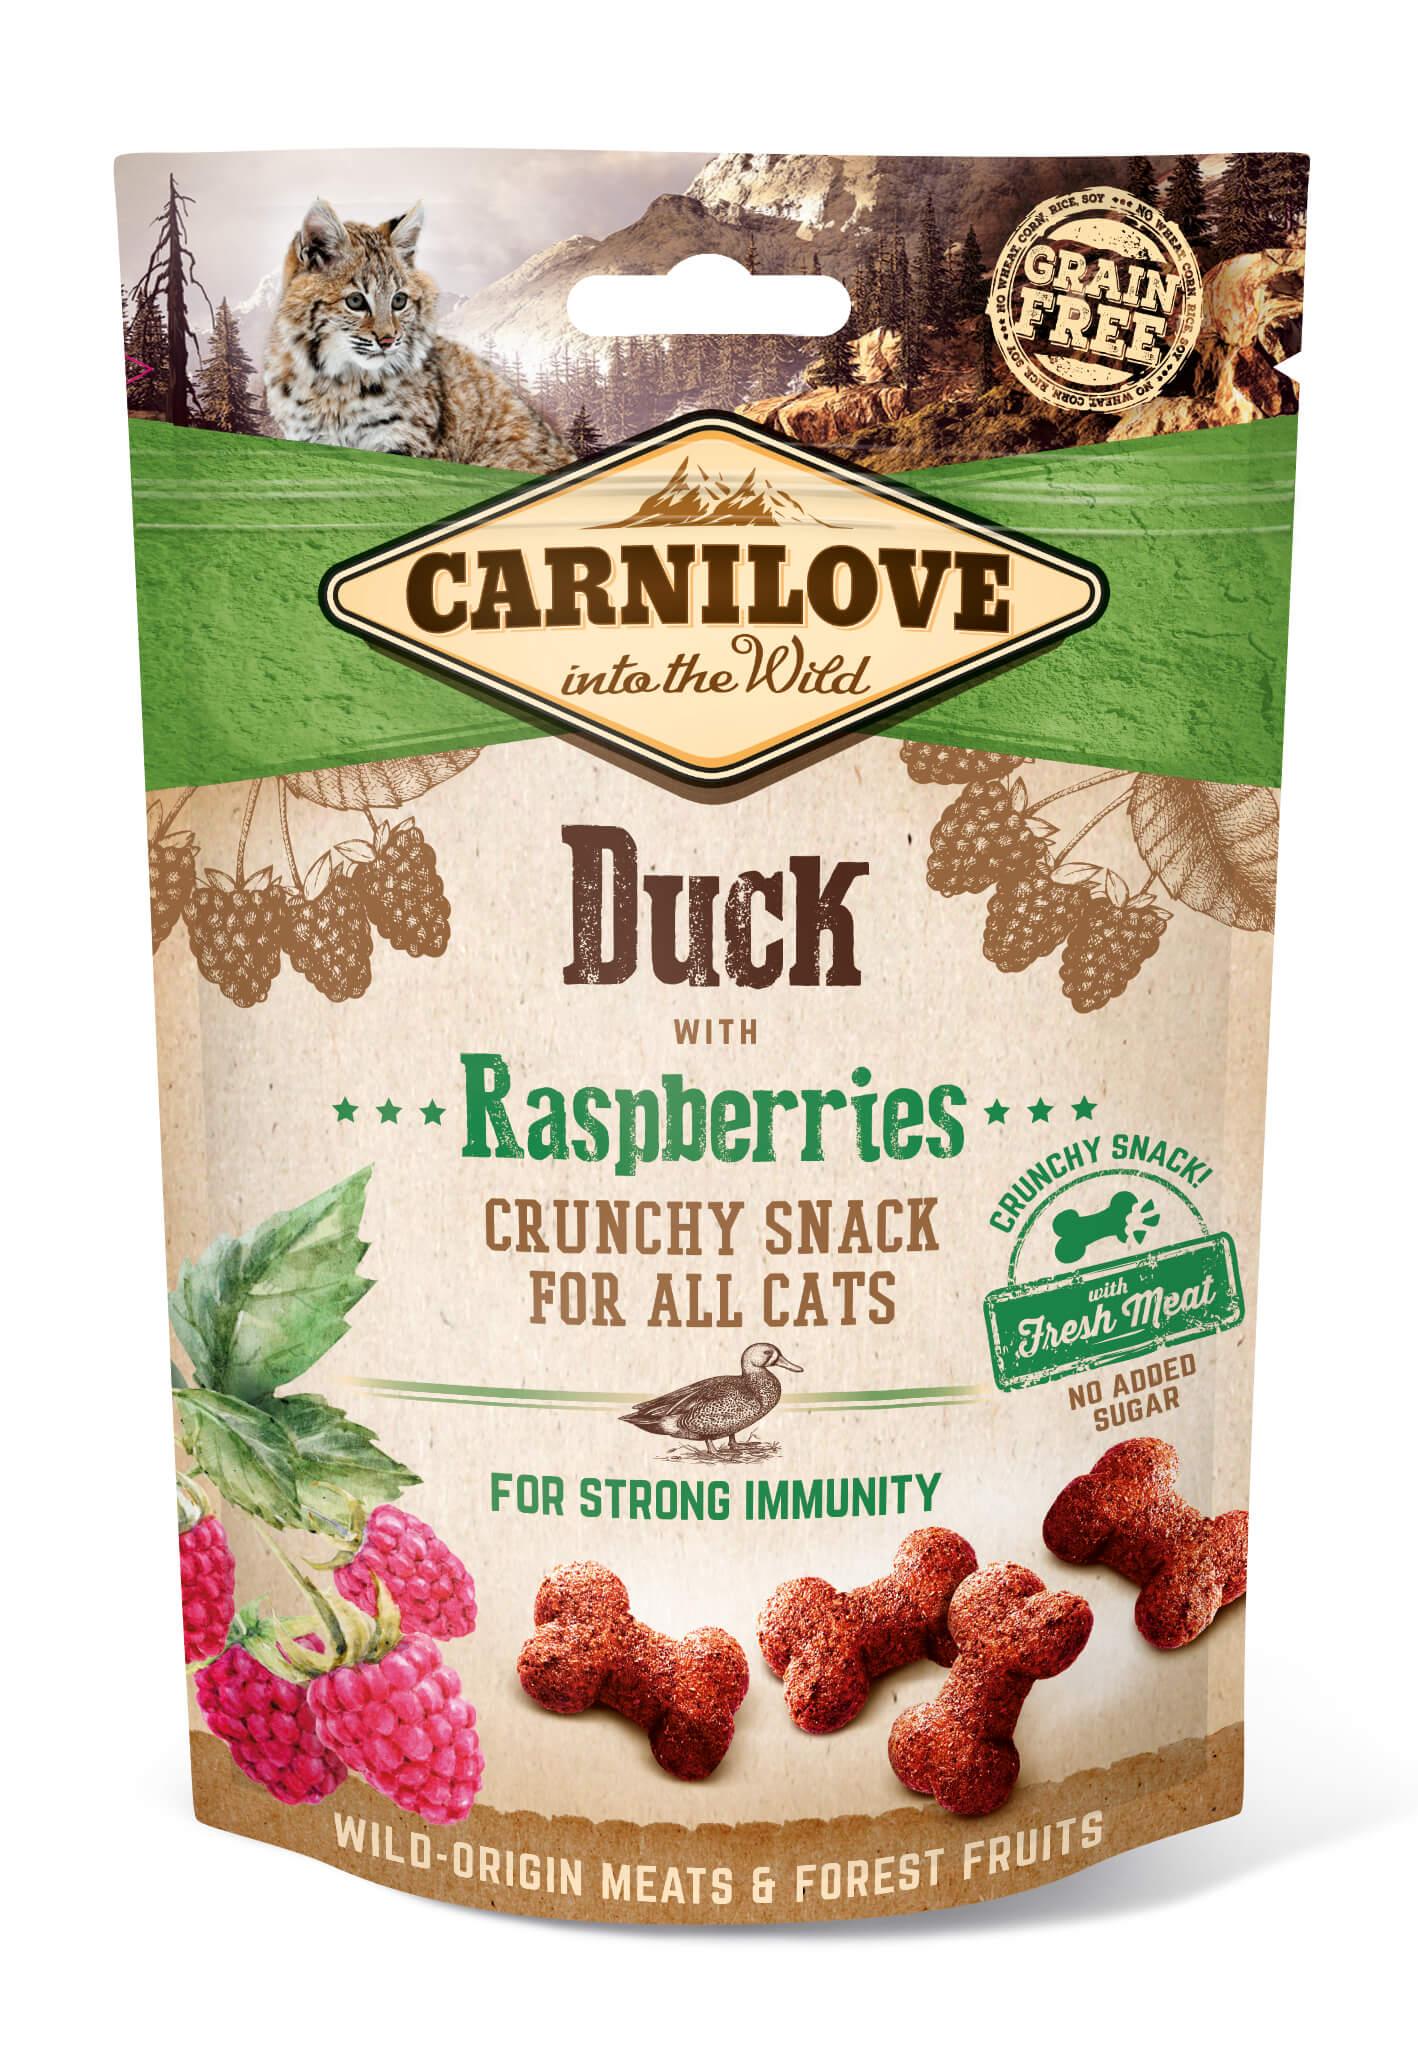 Carnilove Katze Crunchy Snack – Duck with Raspberries